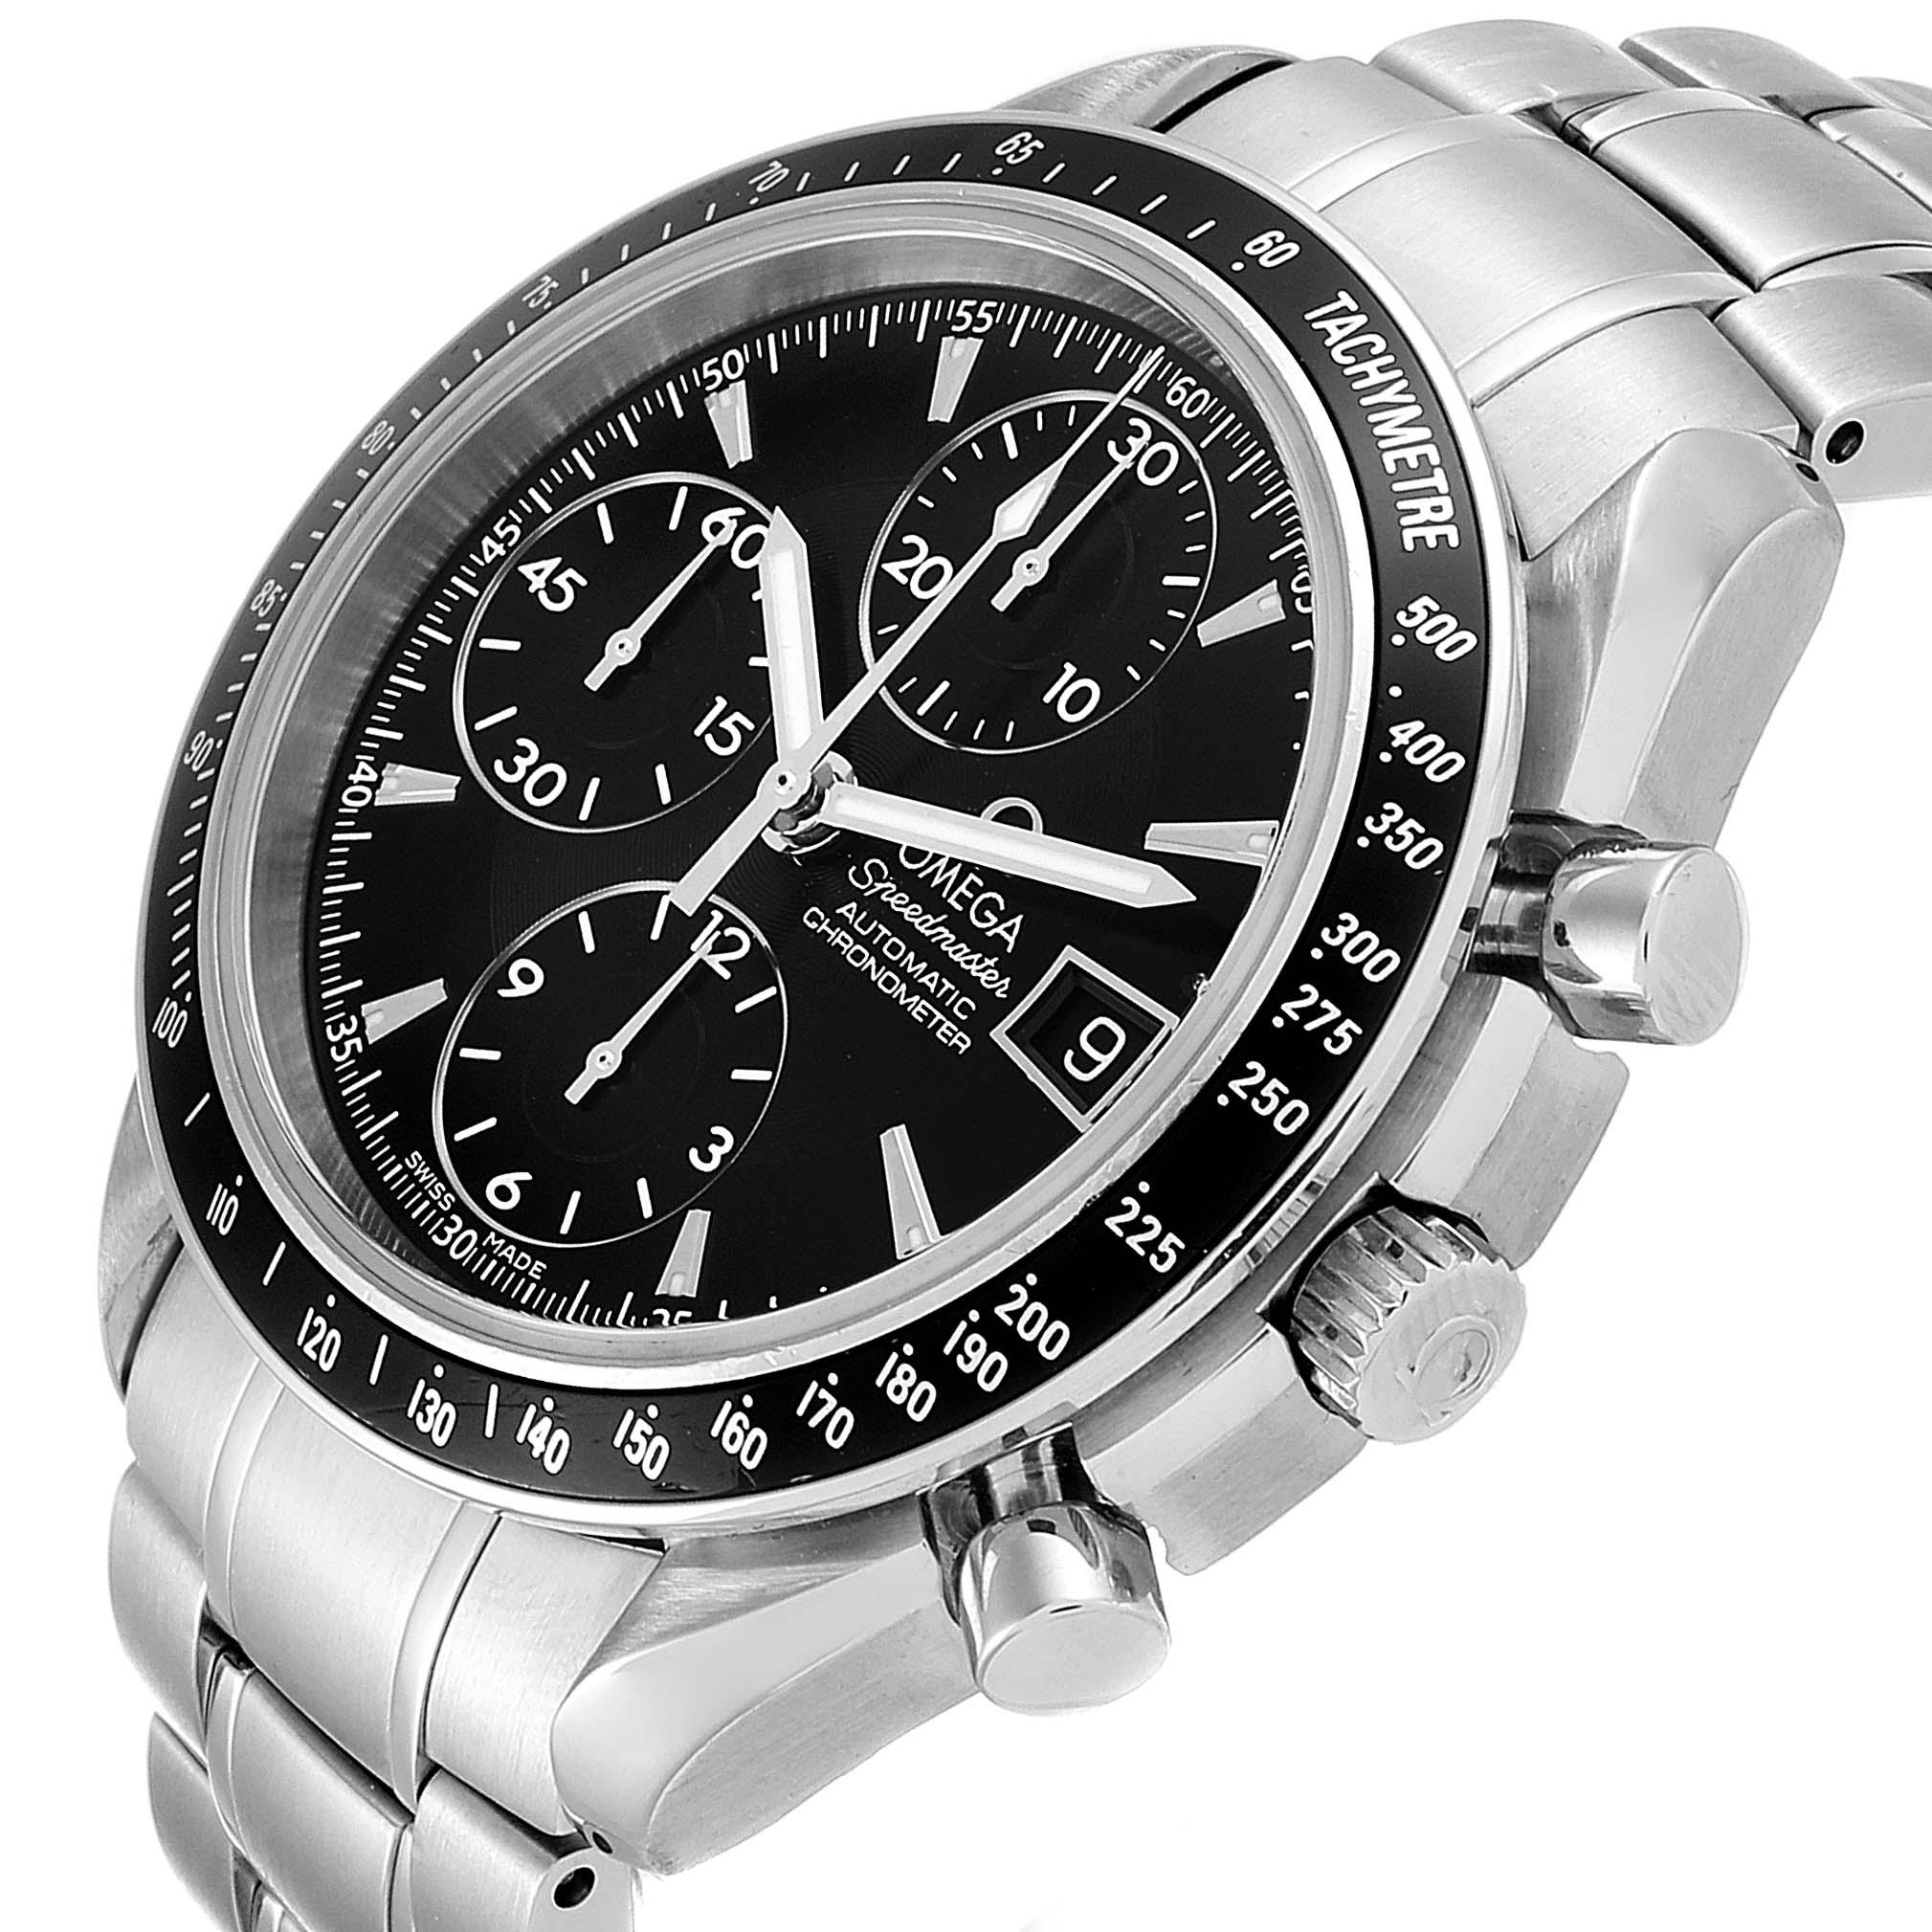 Omega Speedmaster Chronograph Black Dial Steel Mens Watch 3210.50.00 SwissWatchExpo